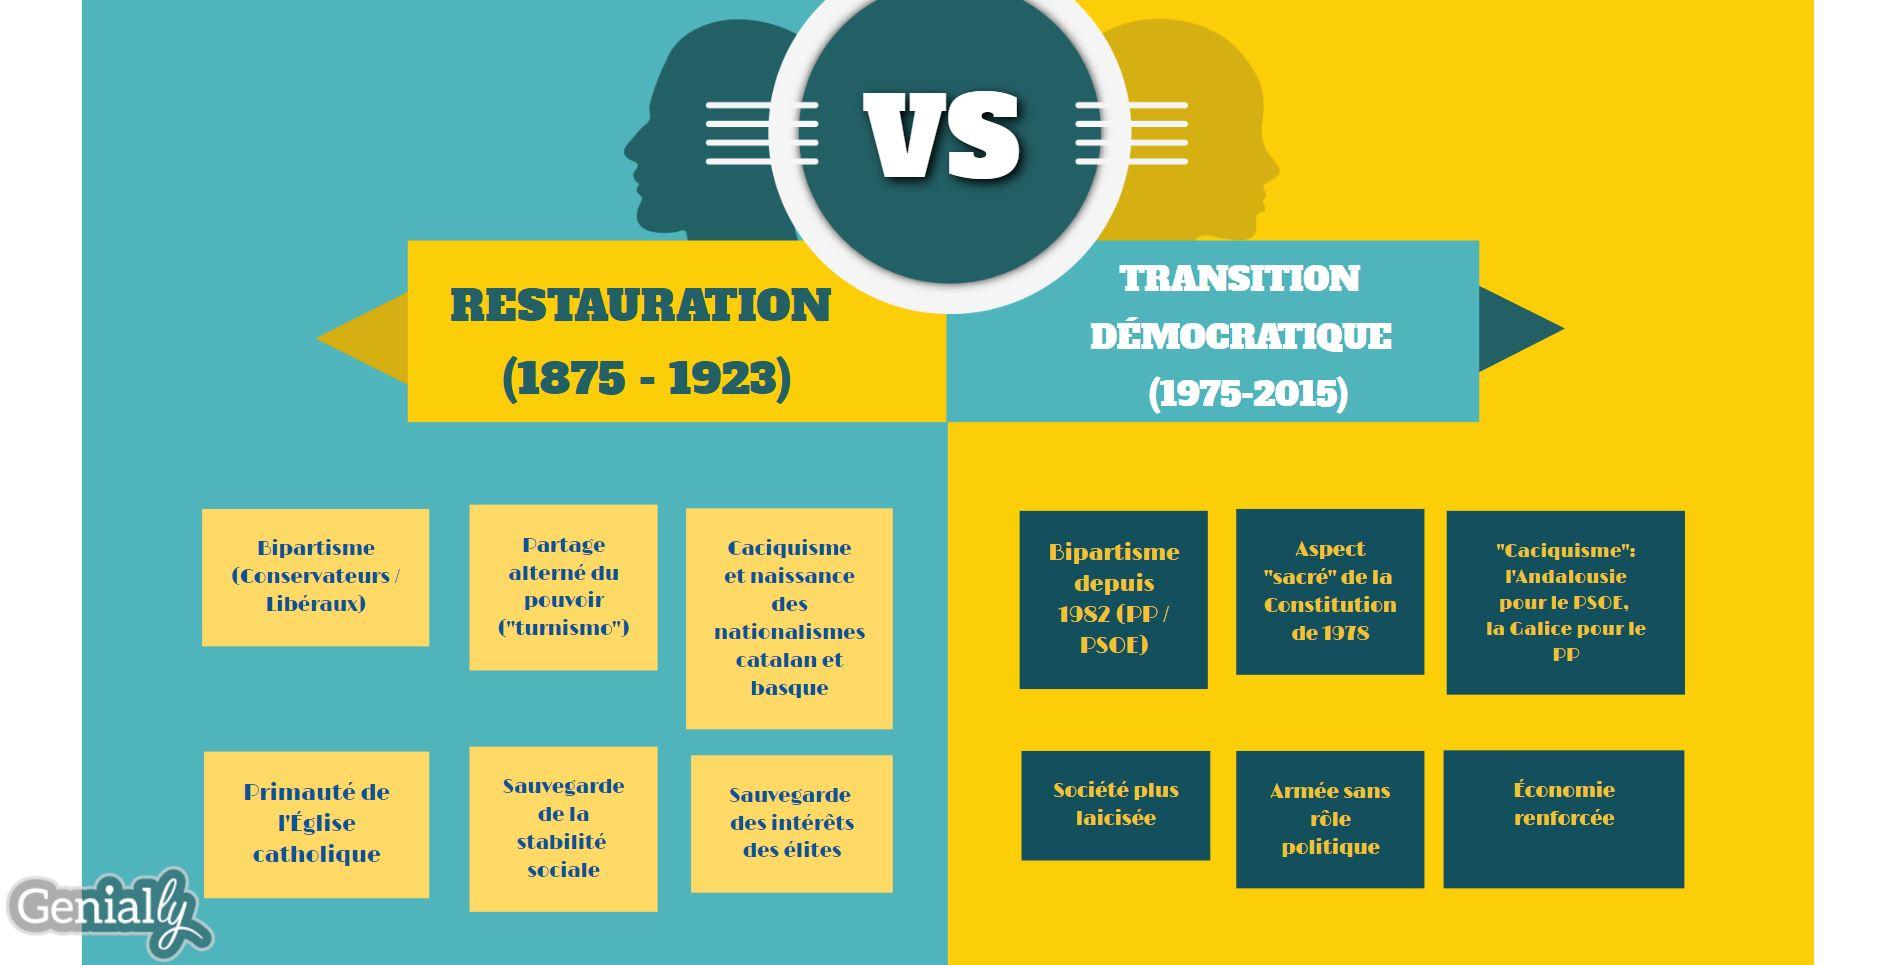 restauration_transition